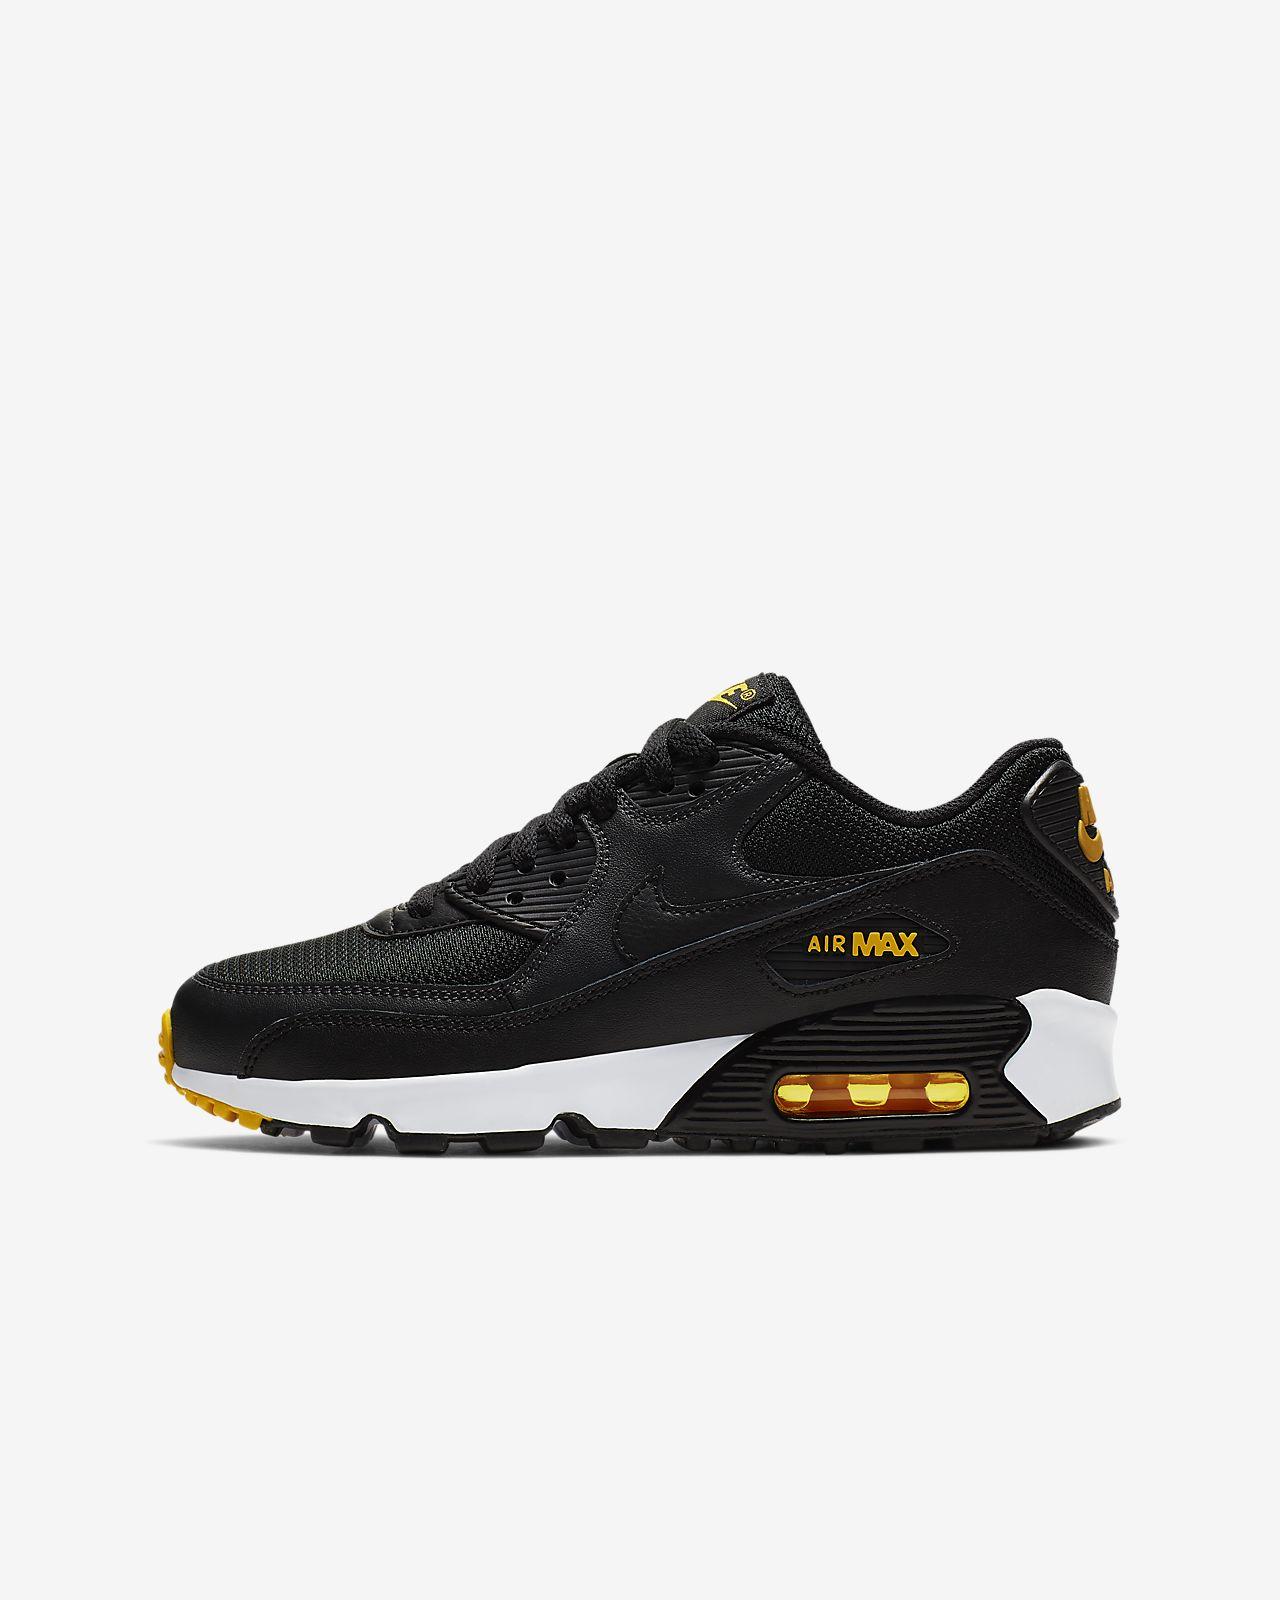 Sko Nike Air Max 90 Mesh för ungdom